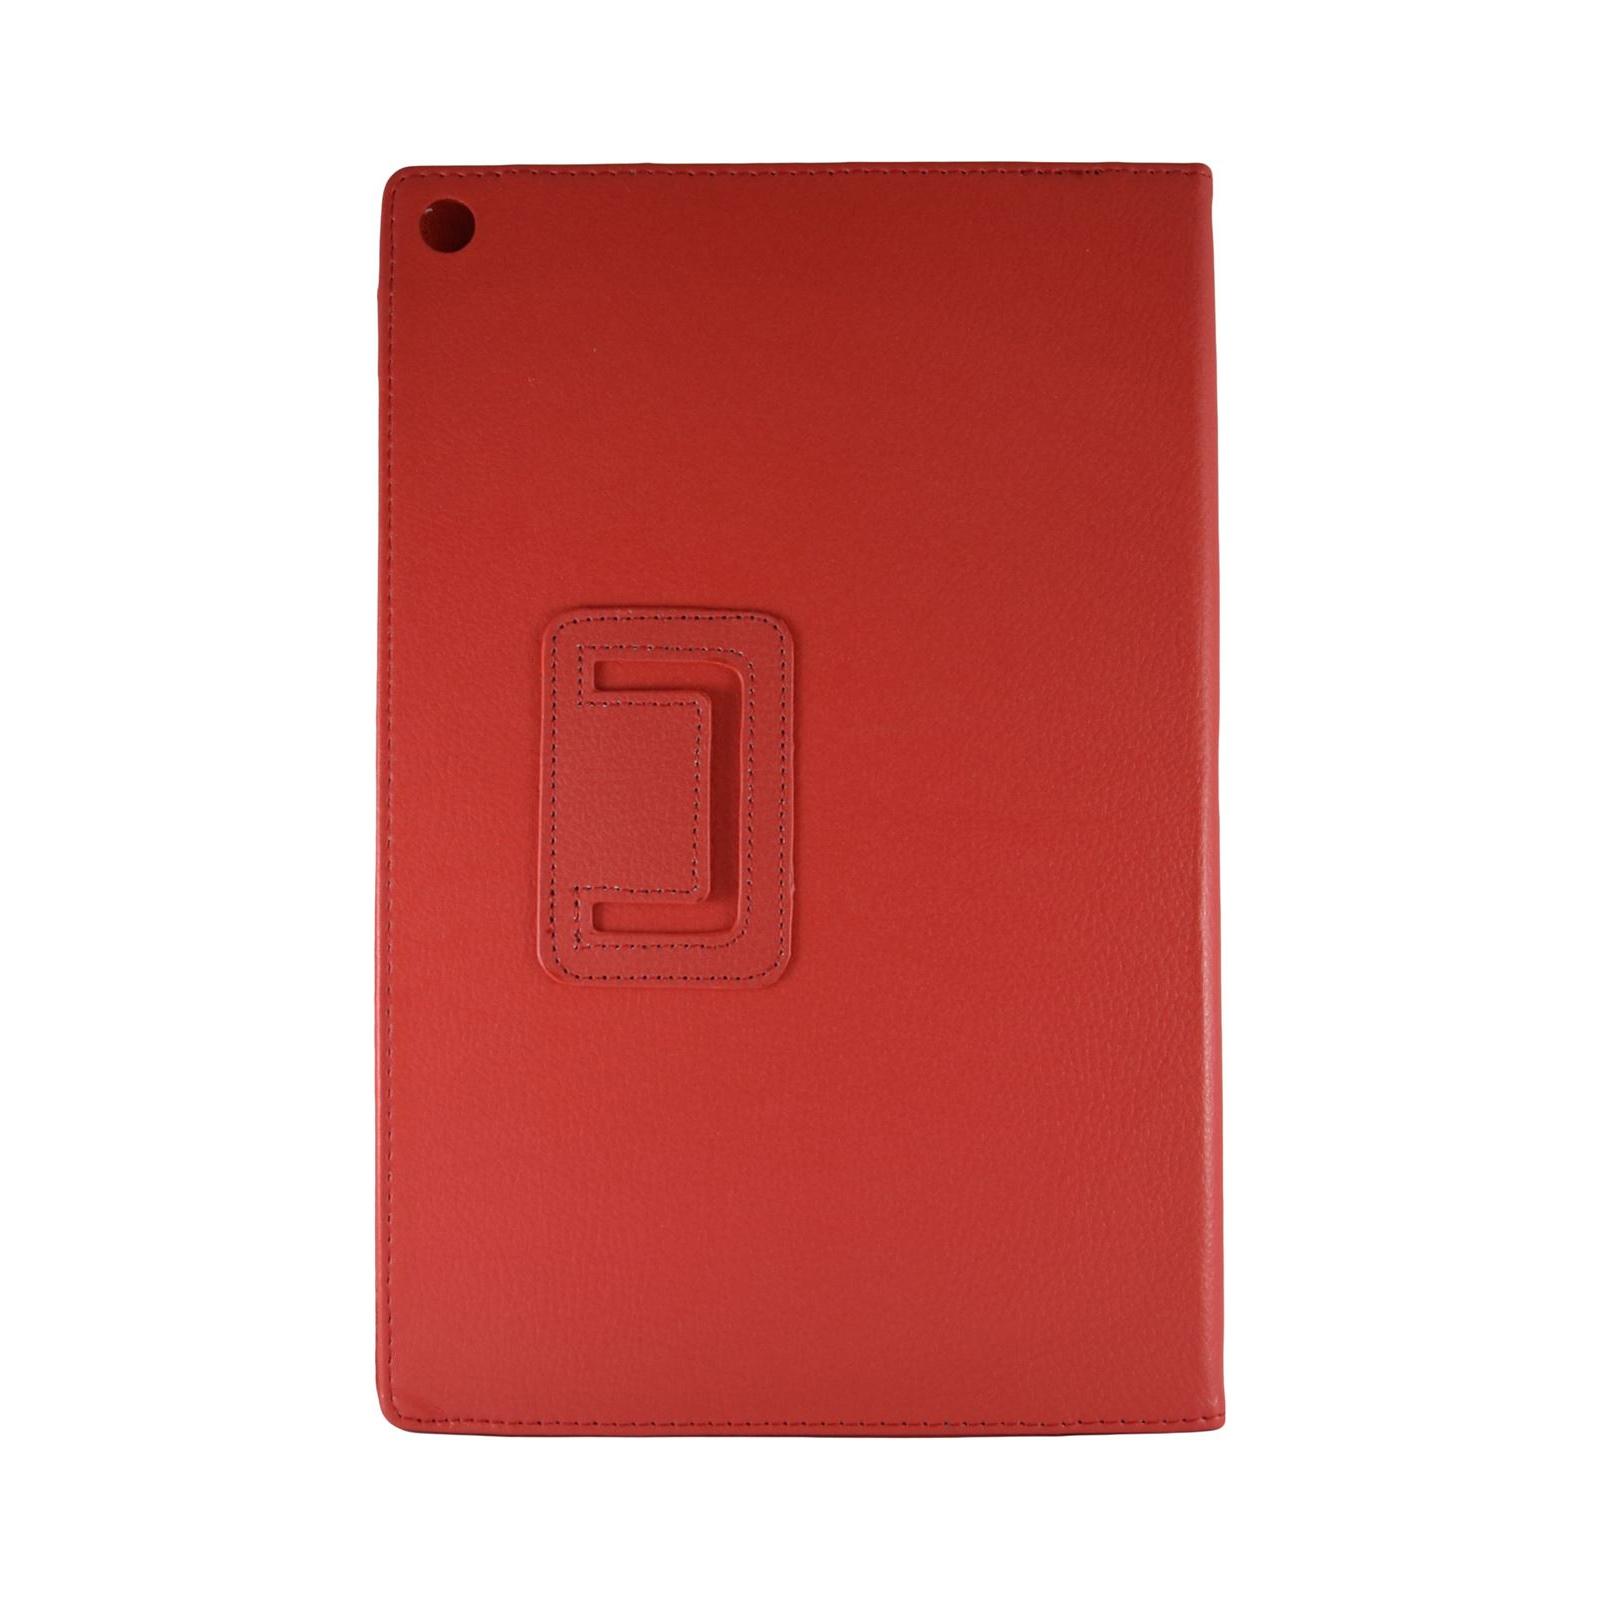 "Чехол для планшета Pro-case 10,1"" Pro-case Sony Tablet Z2 red (PC STZ2red) изображение 2"